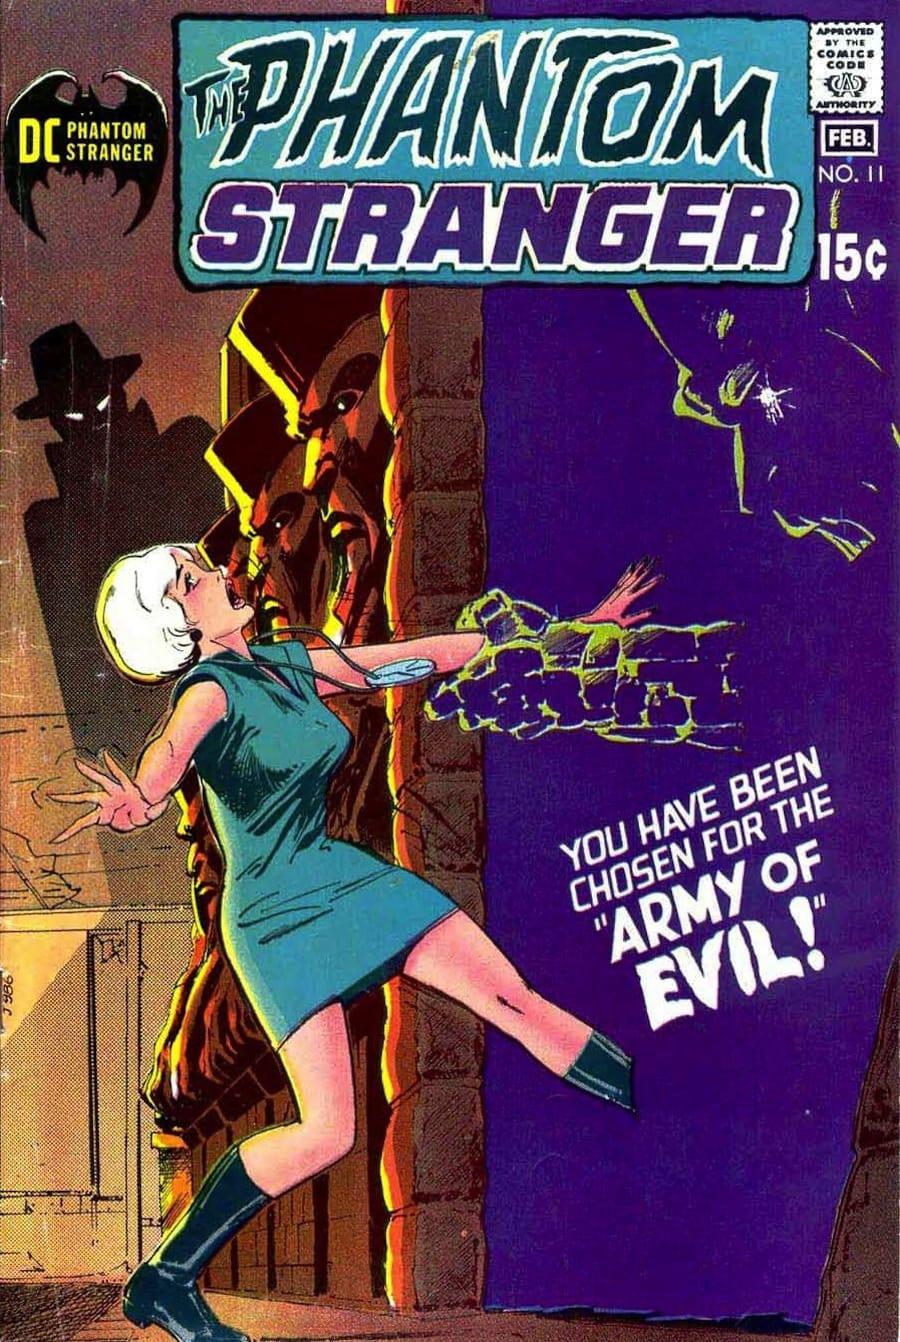 Phantom Stranger #11 - 1970s dc horror comic book cover art by Neal Adams